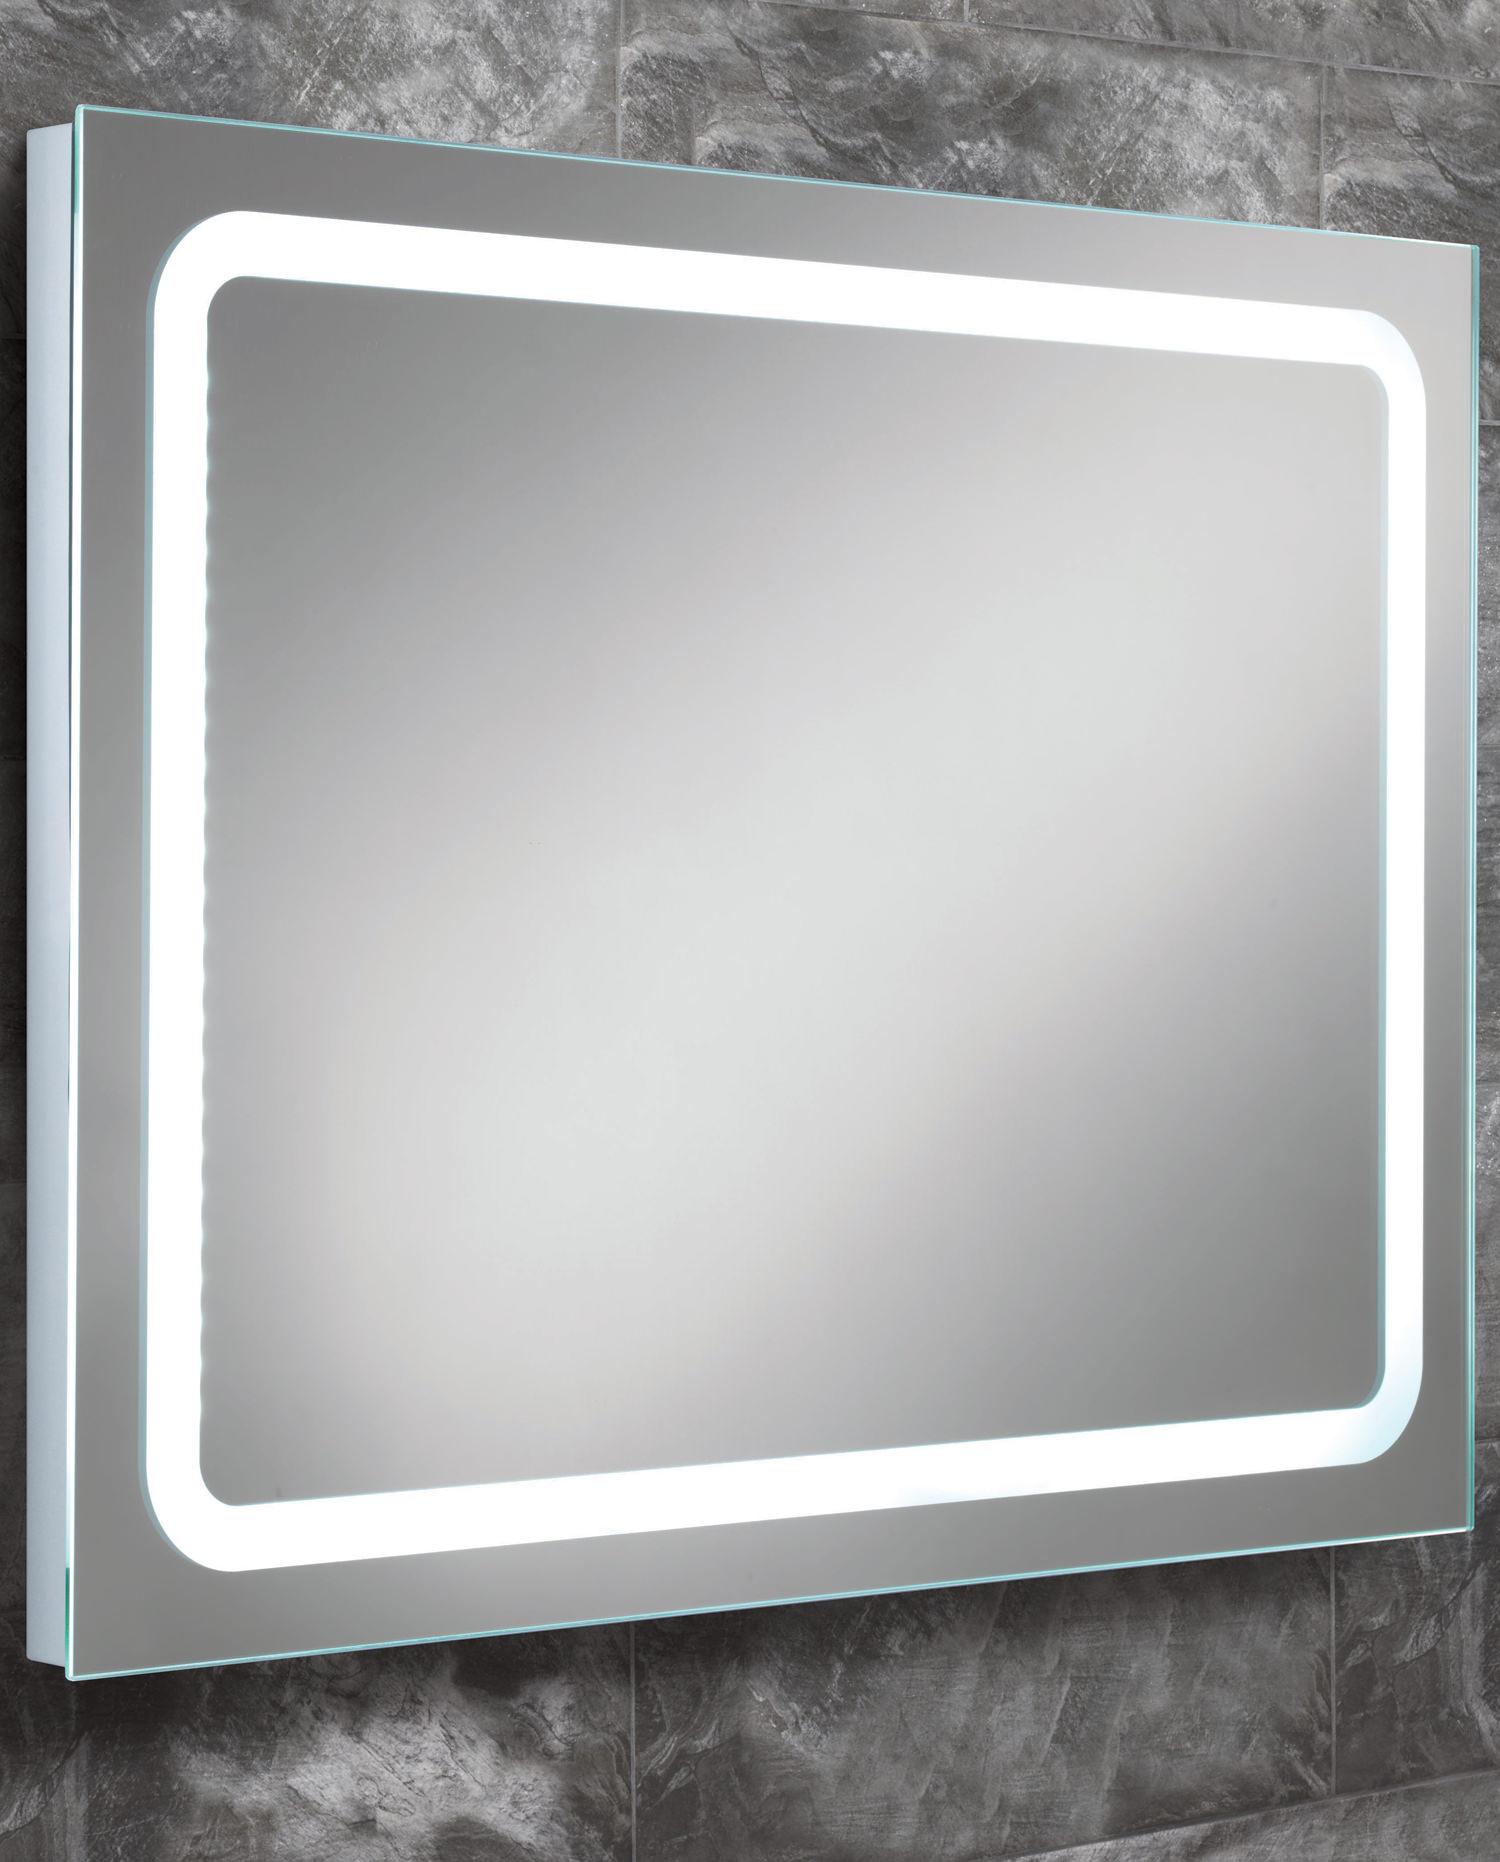 Hib Scarlet Steam Free Led Back Lit Bathroom Mirror 800 X 600mm